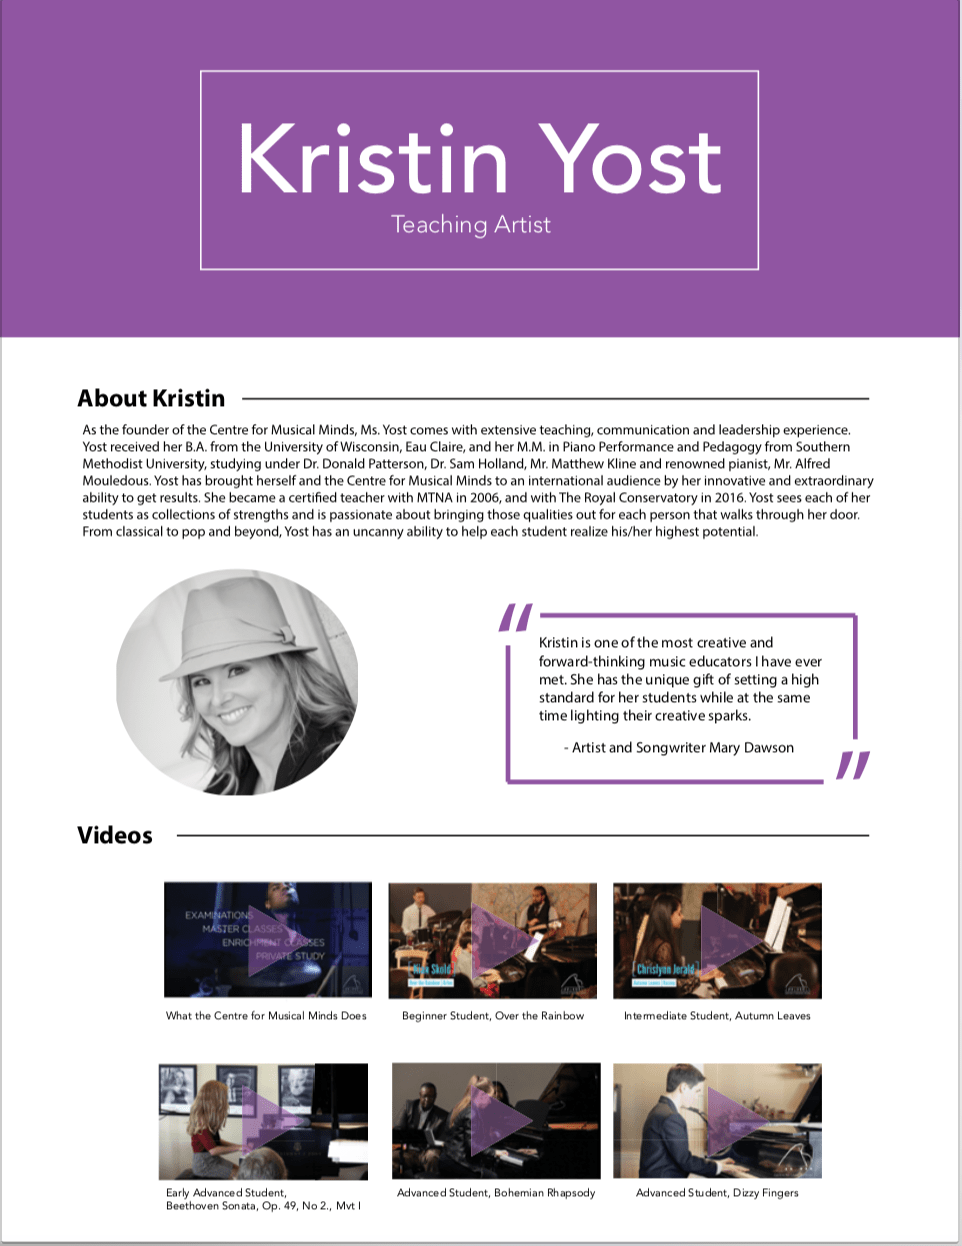 Kristin Yost